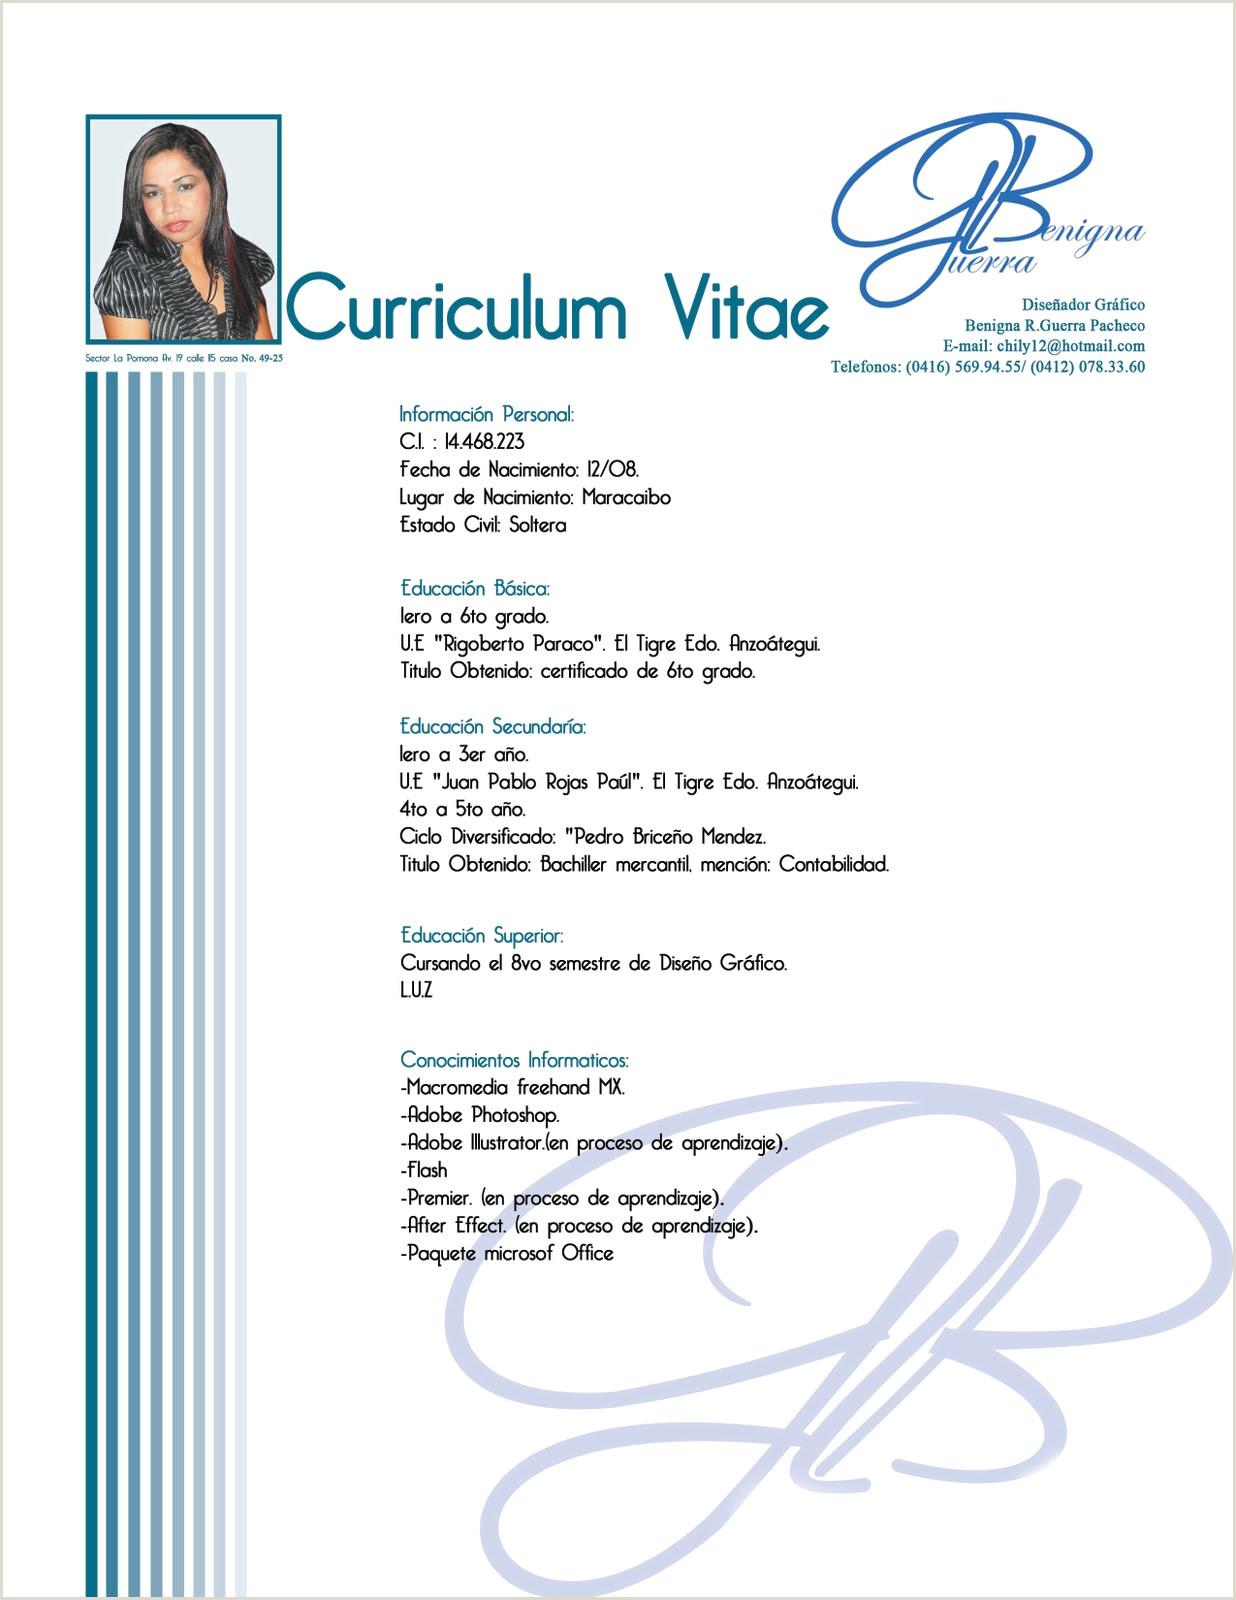 Plantillas Curriculum Vitae En Word Para Rellenar Gratis